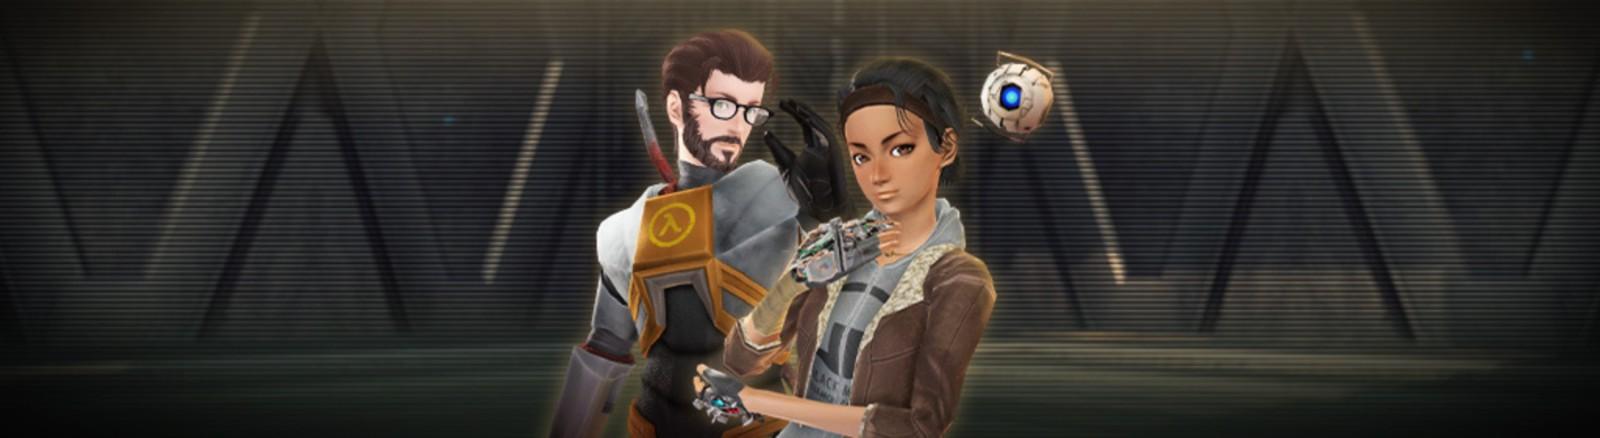 Phantasy Star Online 2's Steam launch is offering Half-Life bonuses screenshot